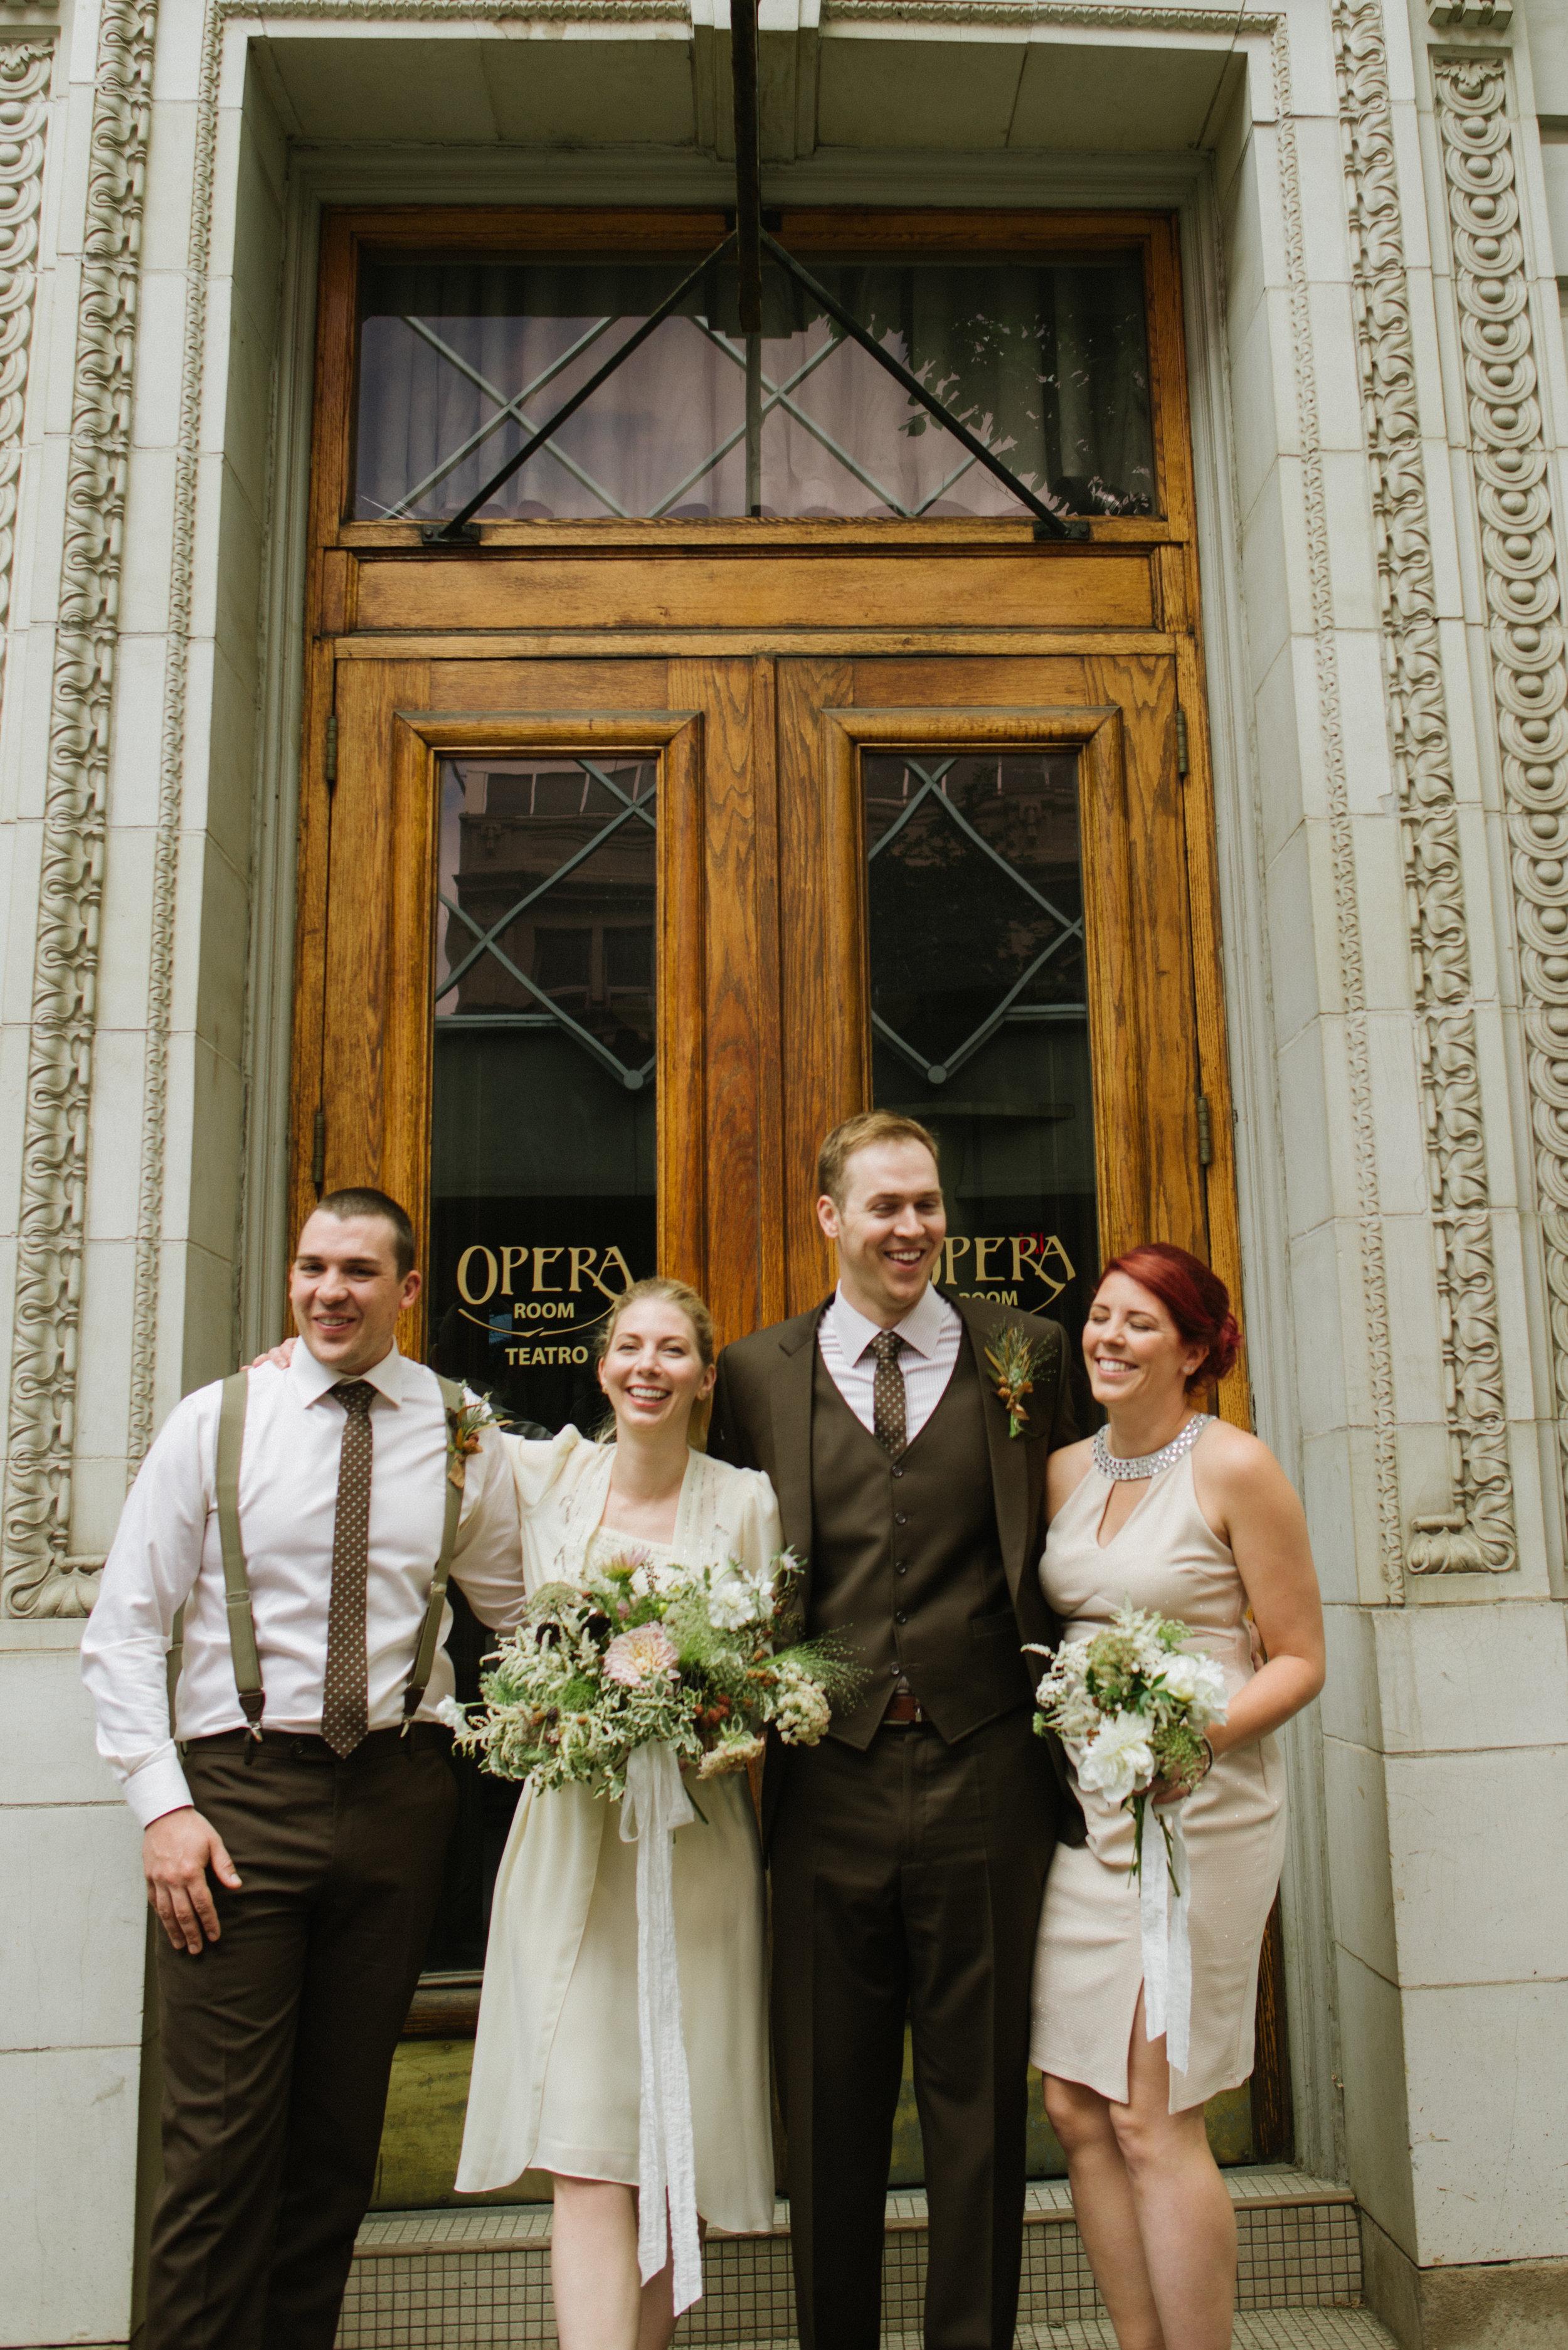 Teatro_Wedding_Calgary_Wedding_Photography_Vanessa_Tom_Married_2018_HR014.jpg